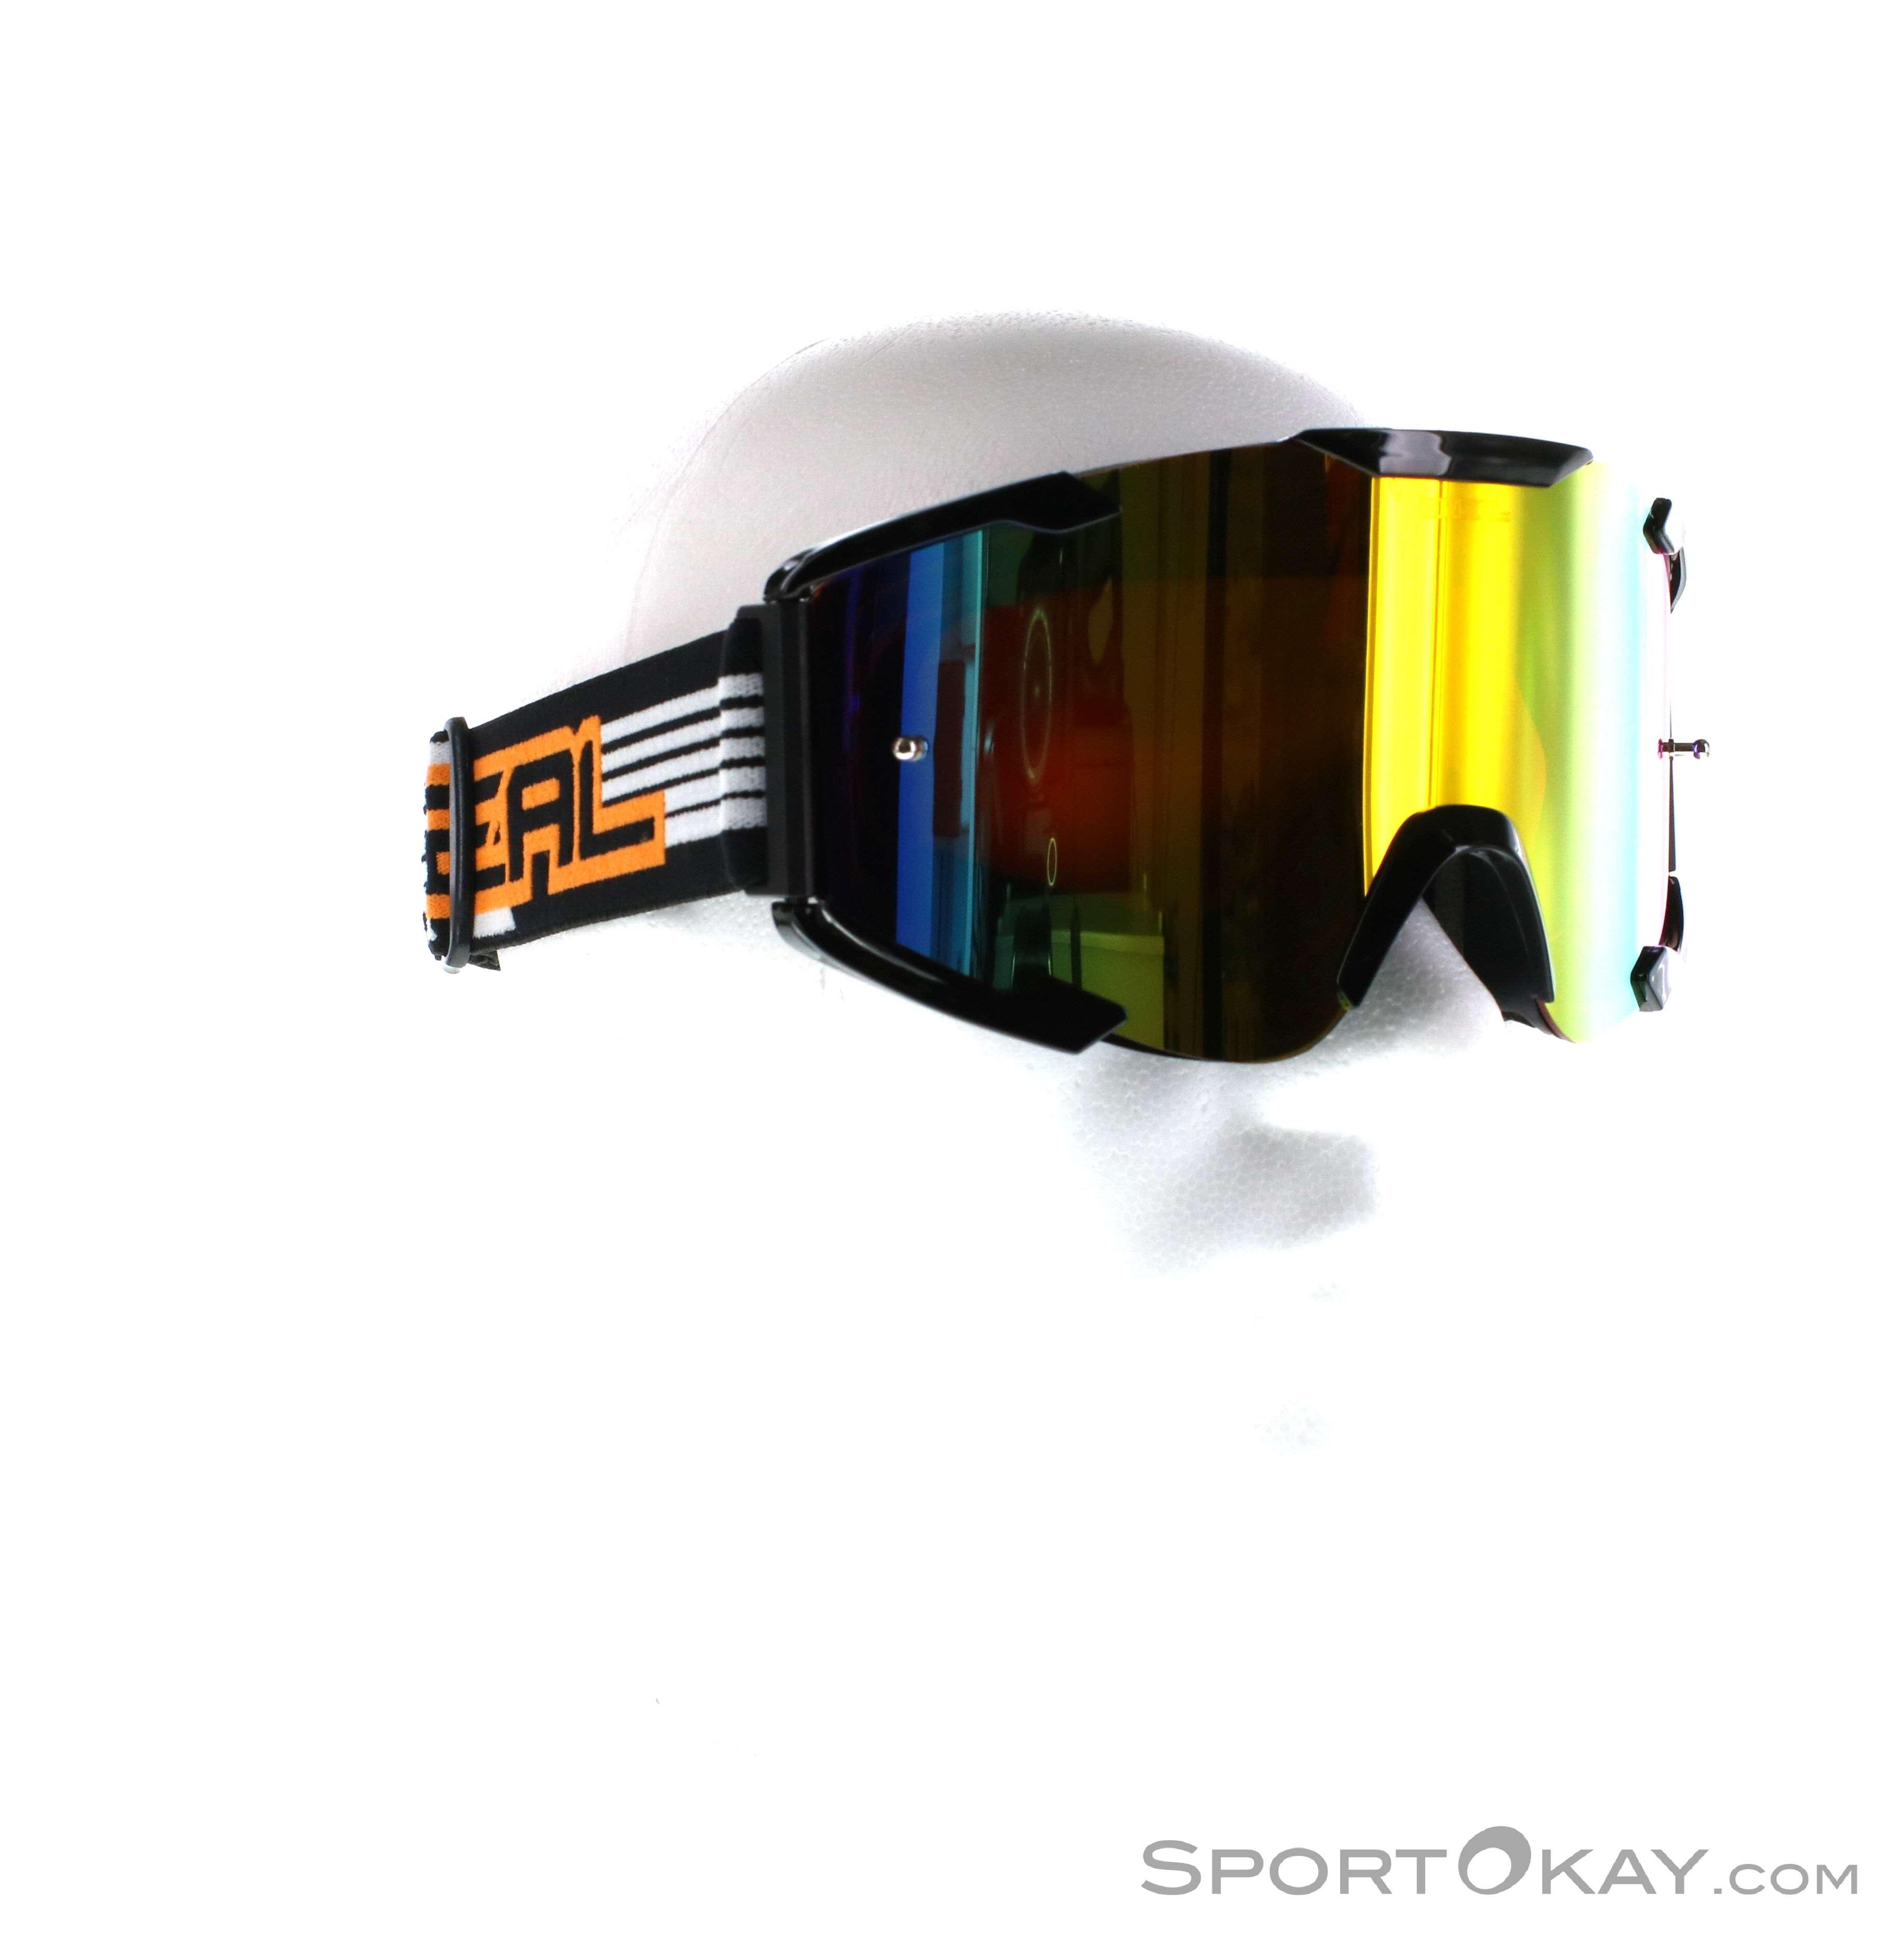 Oneal B2R2 ThreeSixZero Goggle Downhillbrille, Oneal, Orange, , Herren, 0264-10014, 5637554243, 4046068459936, N1-01.jpg